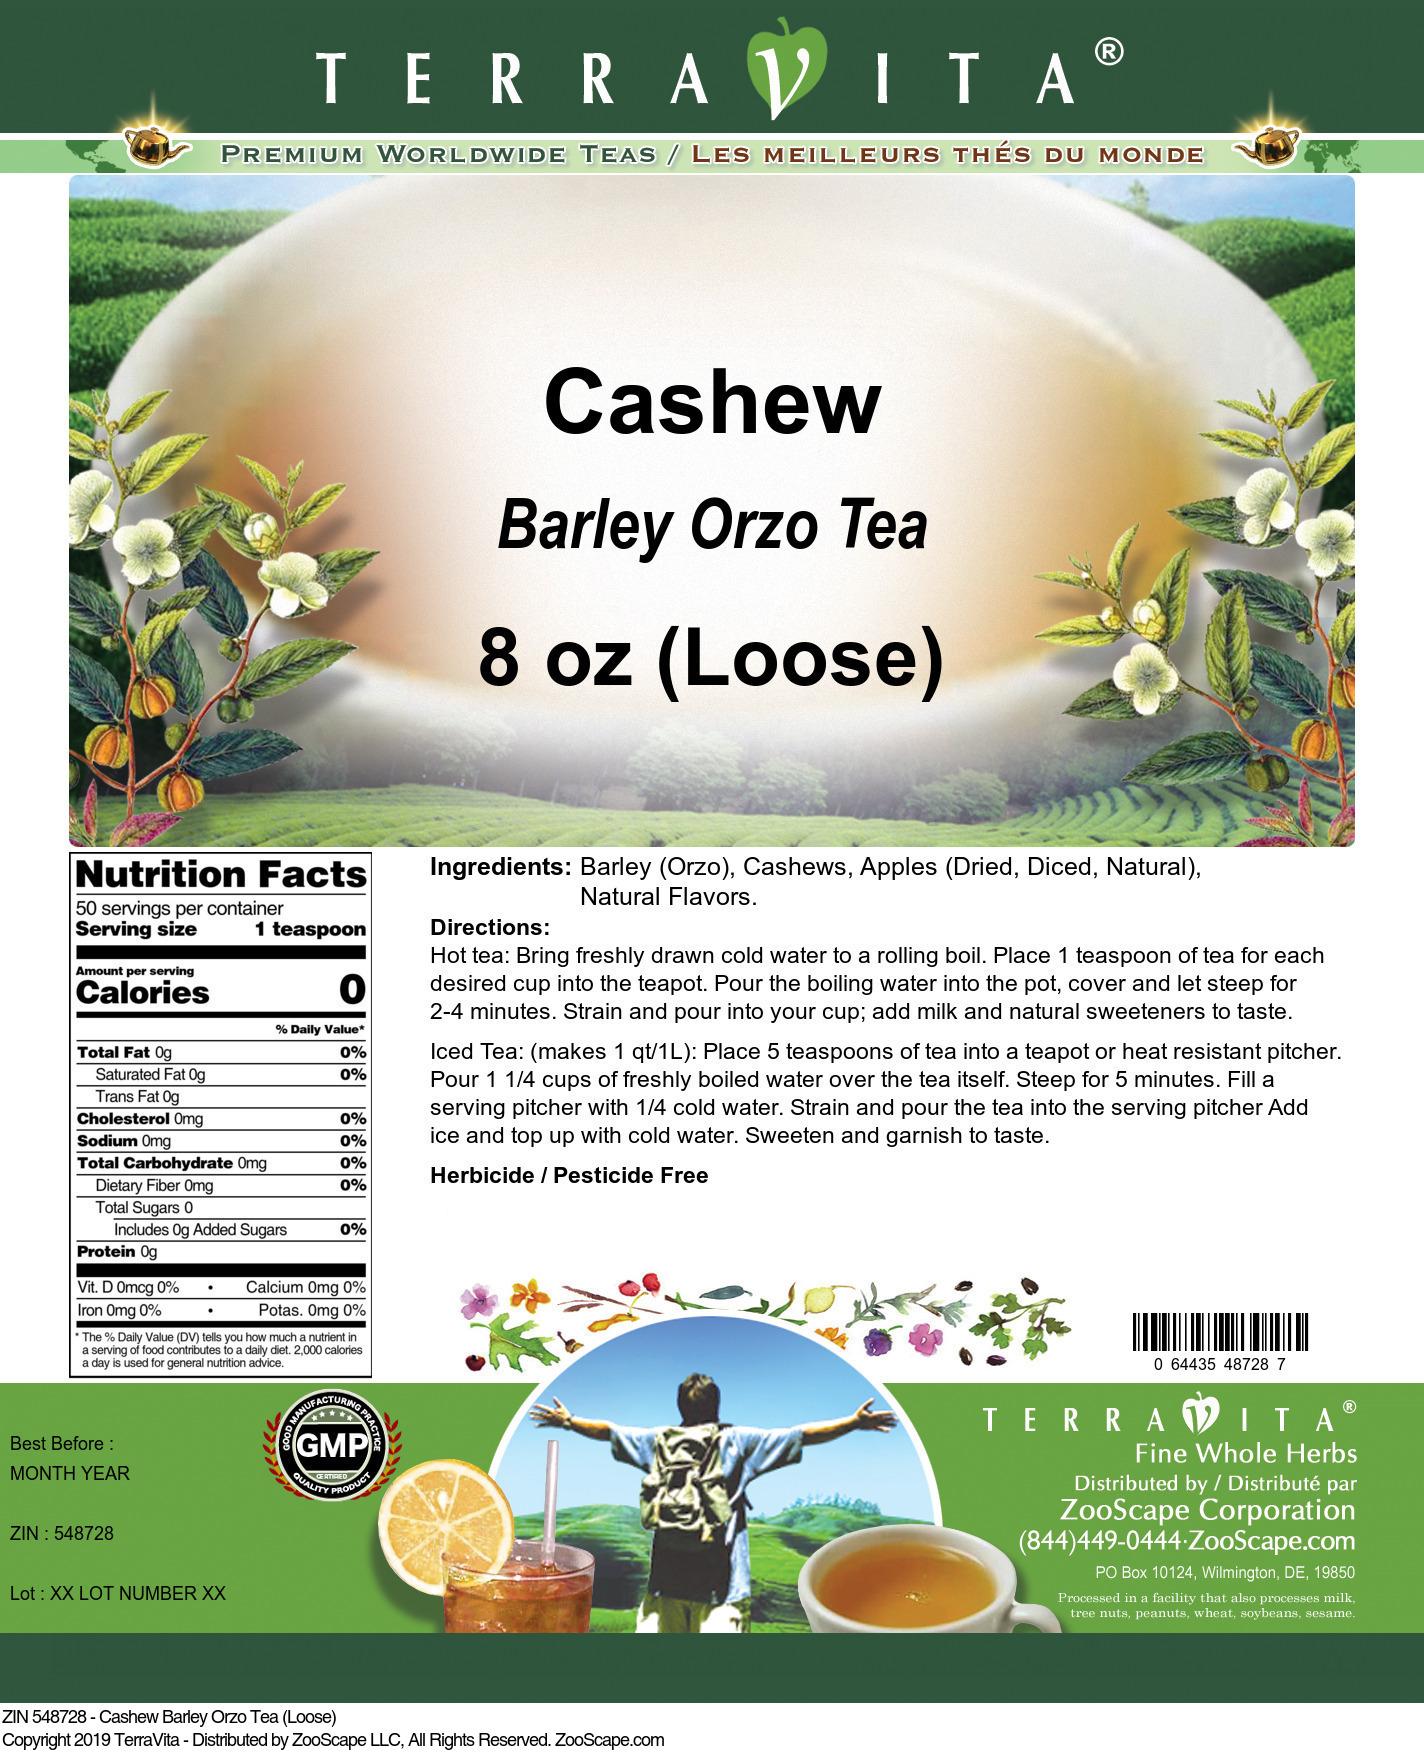 Cashew Barley Orzo Tea (Loose)